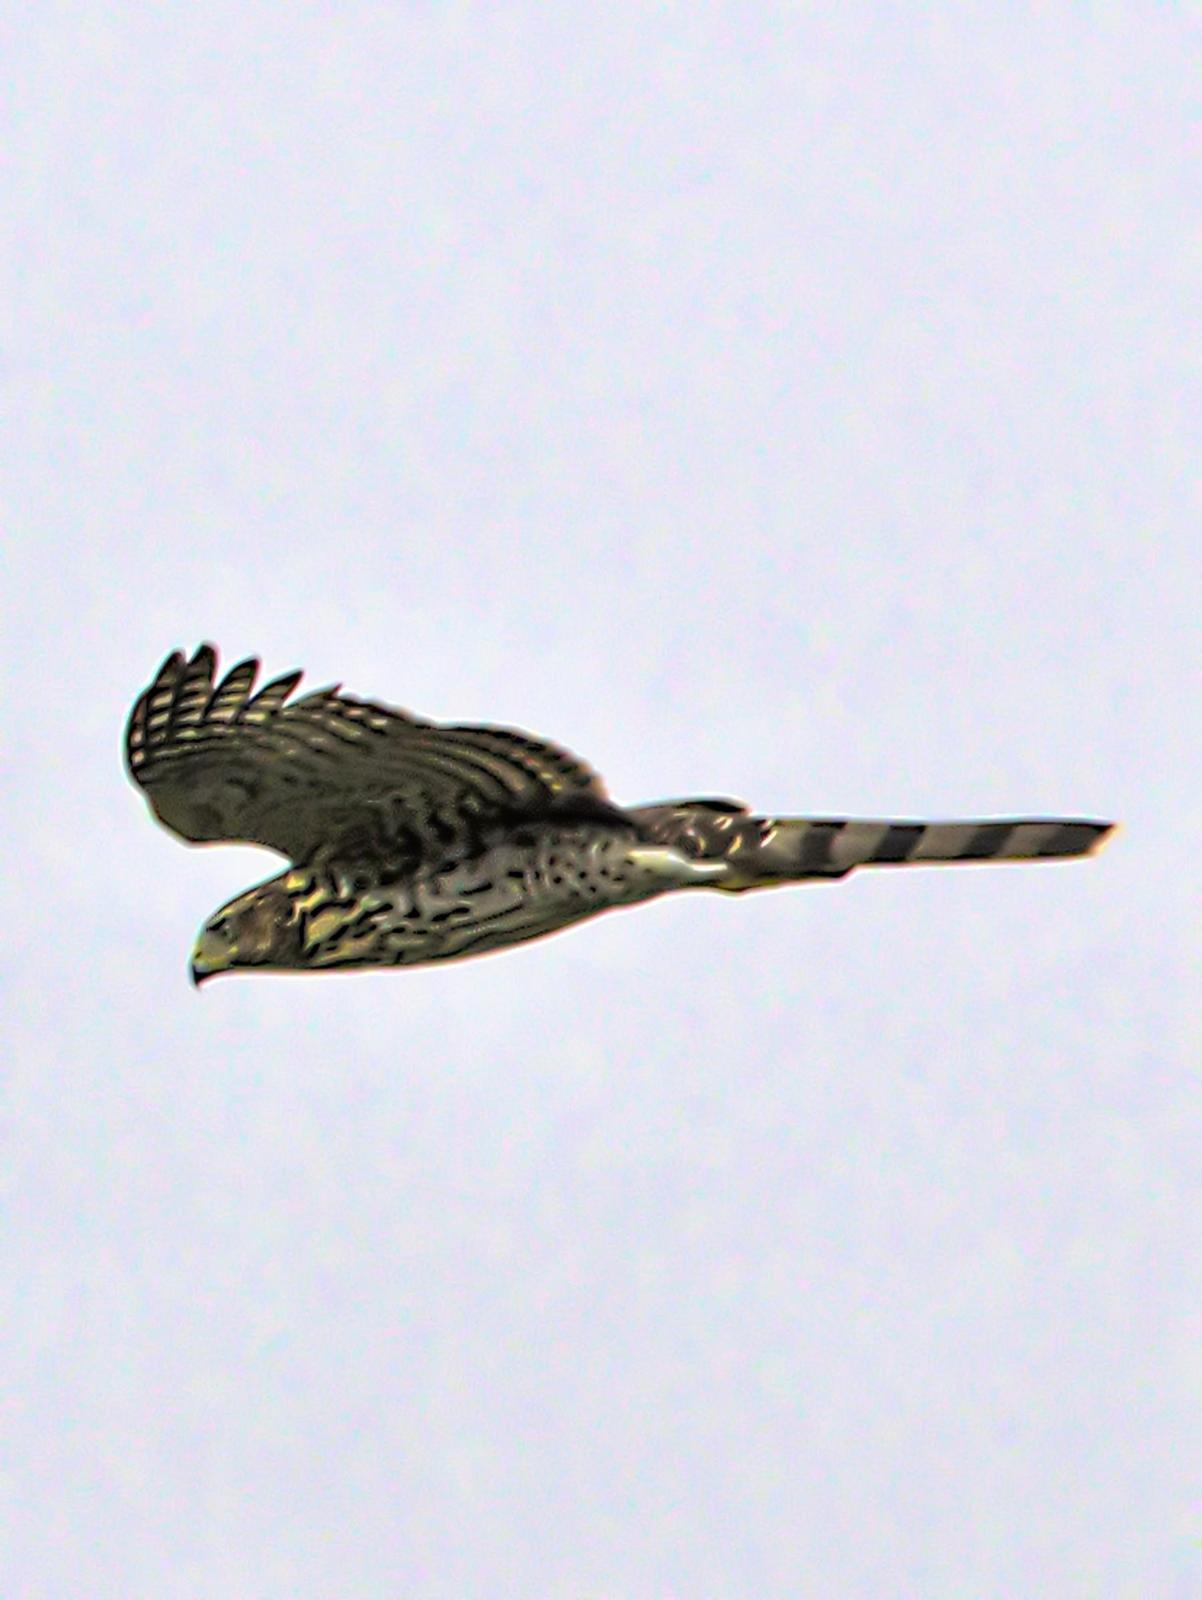 Cooper's Hawk Photo by Dan Tallman